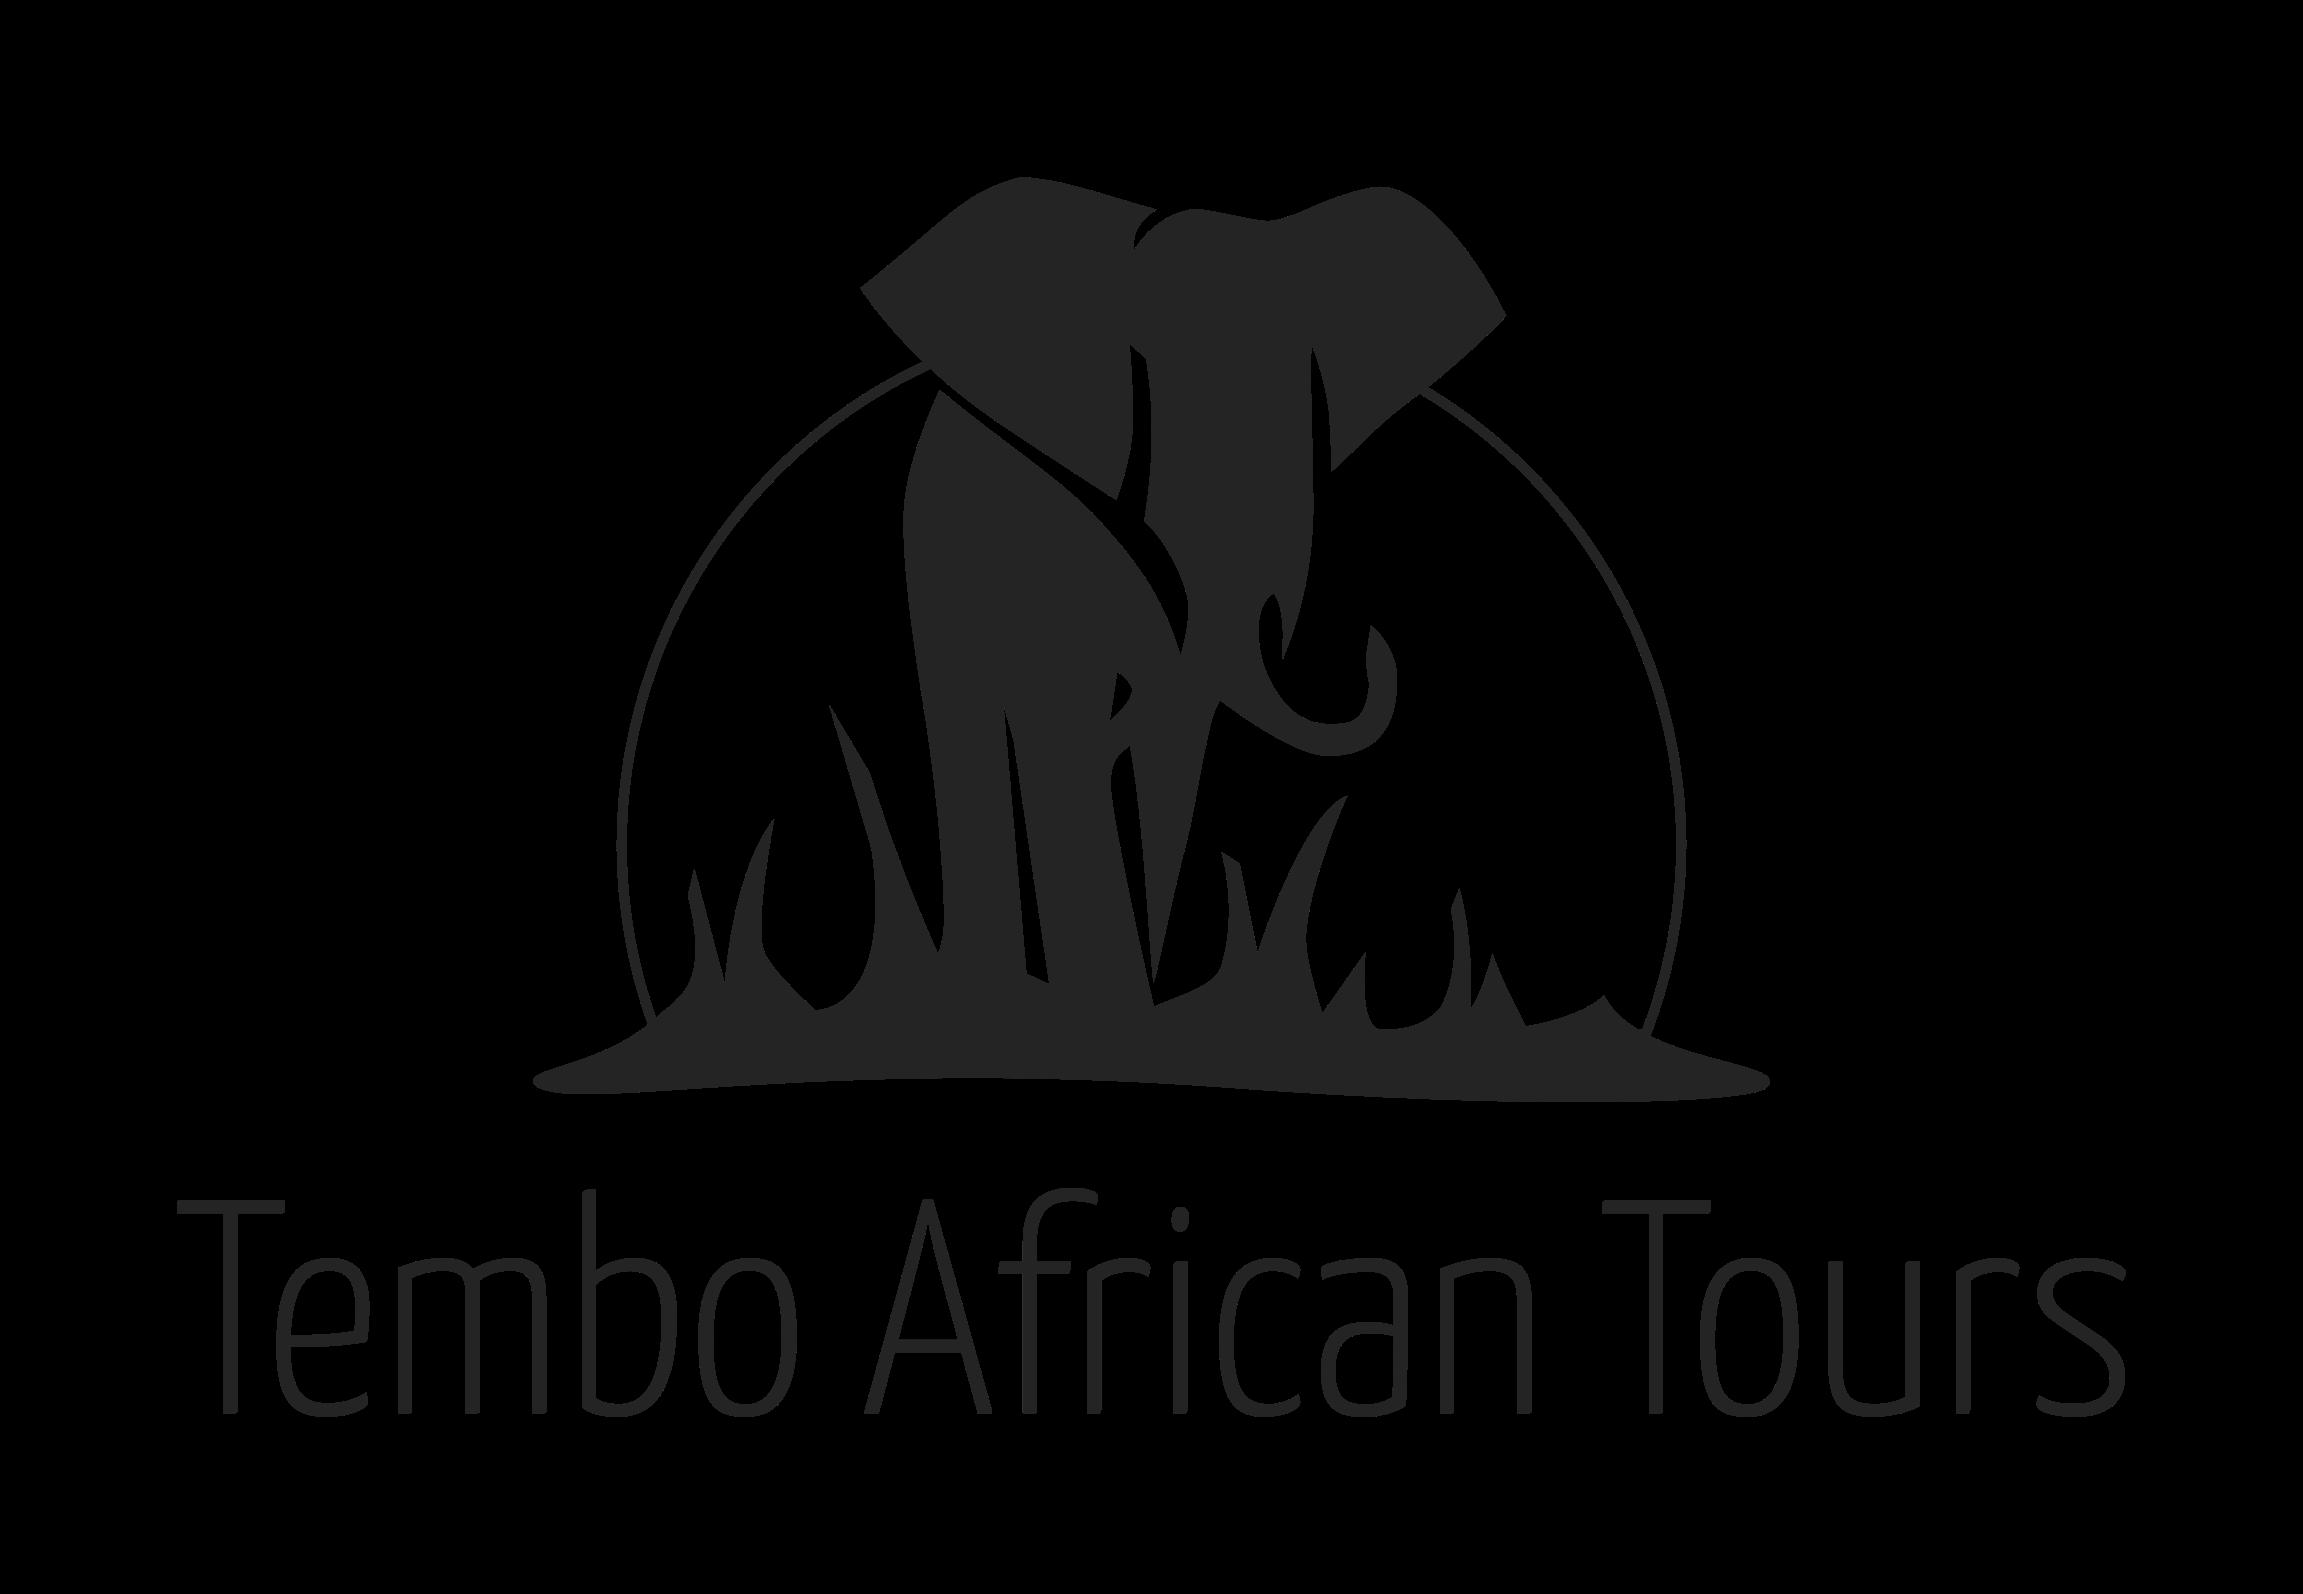 Guide safari i sydafrika